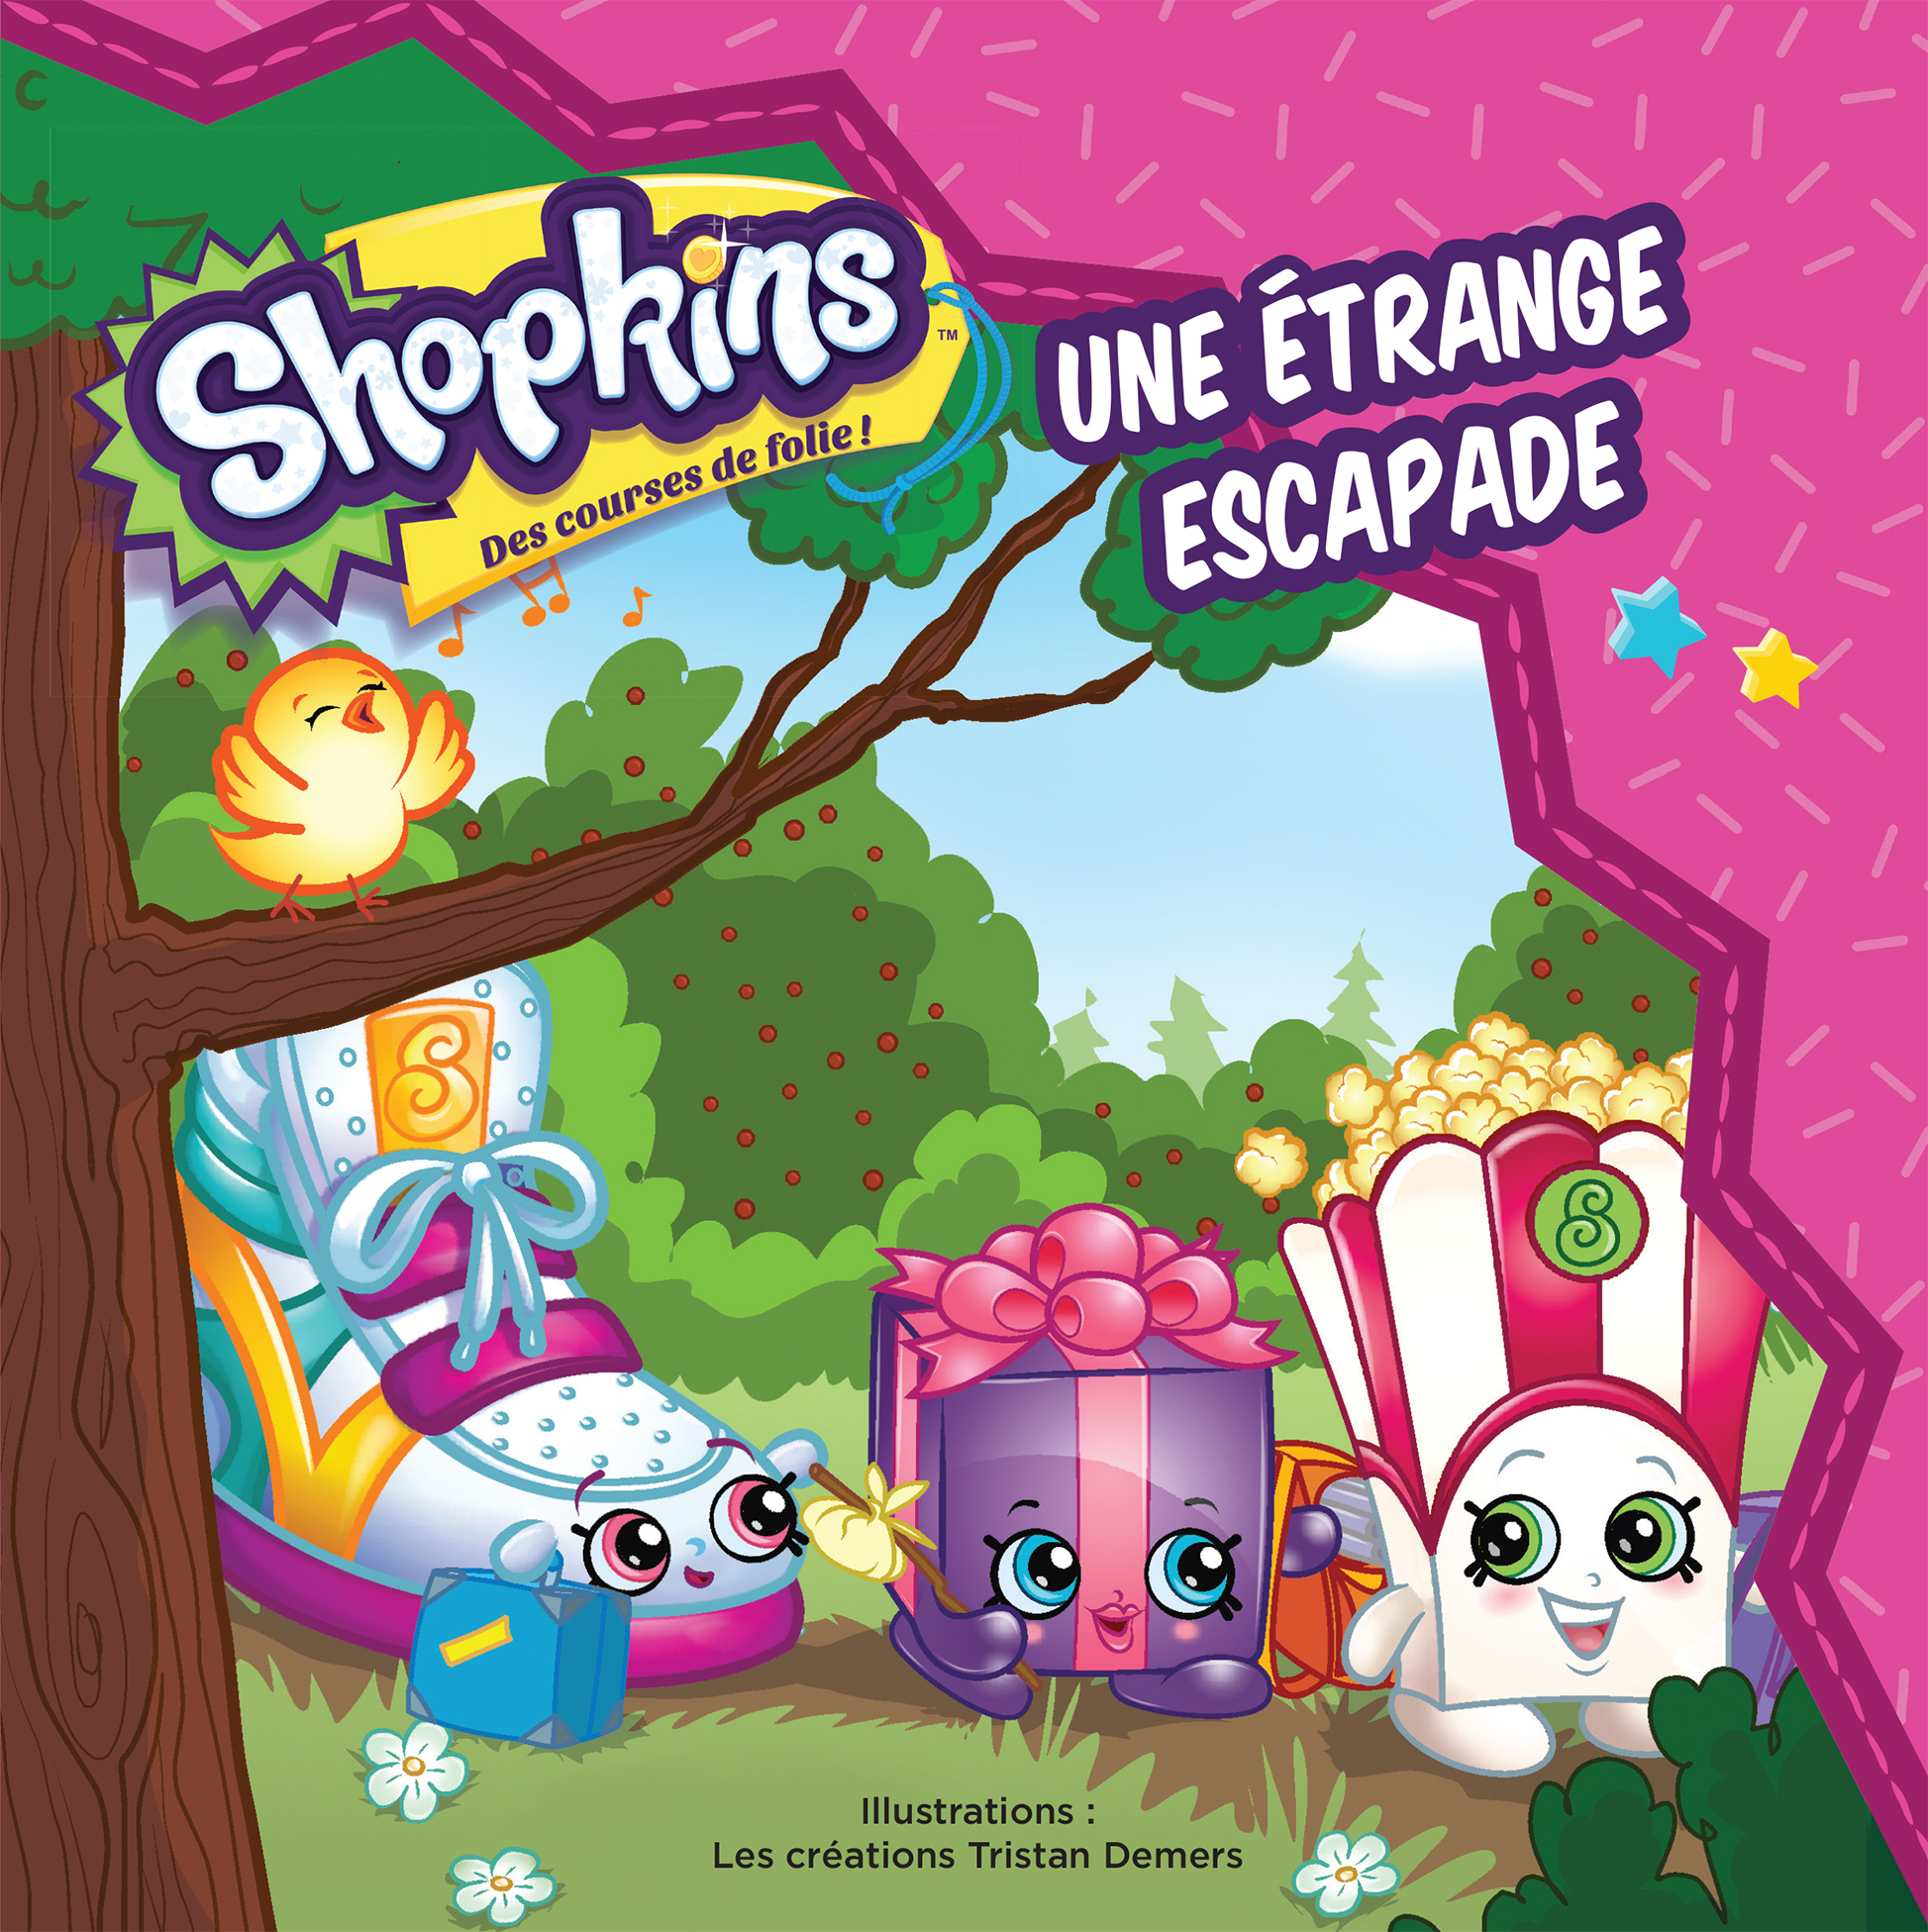 454_Shopkins5_EtrangeEscapade_C1